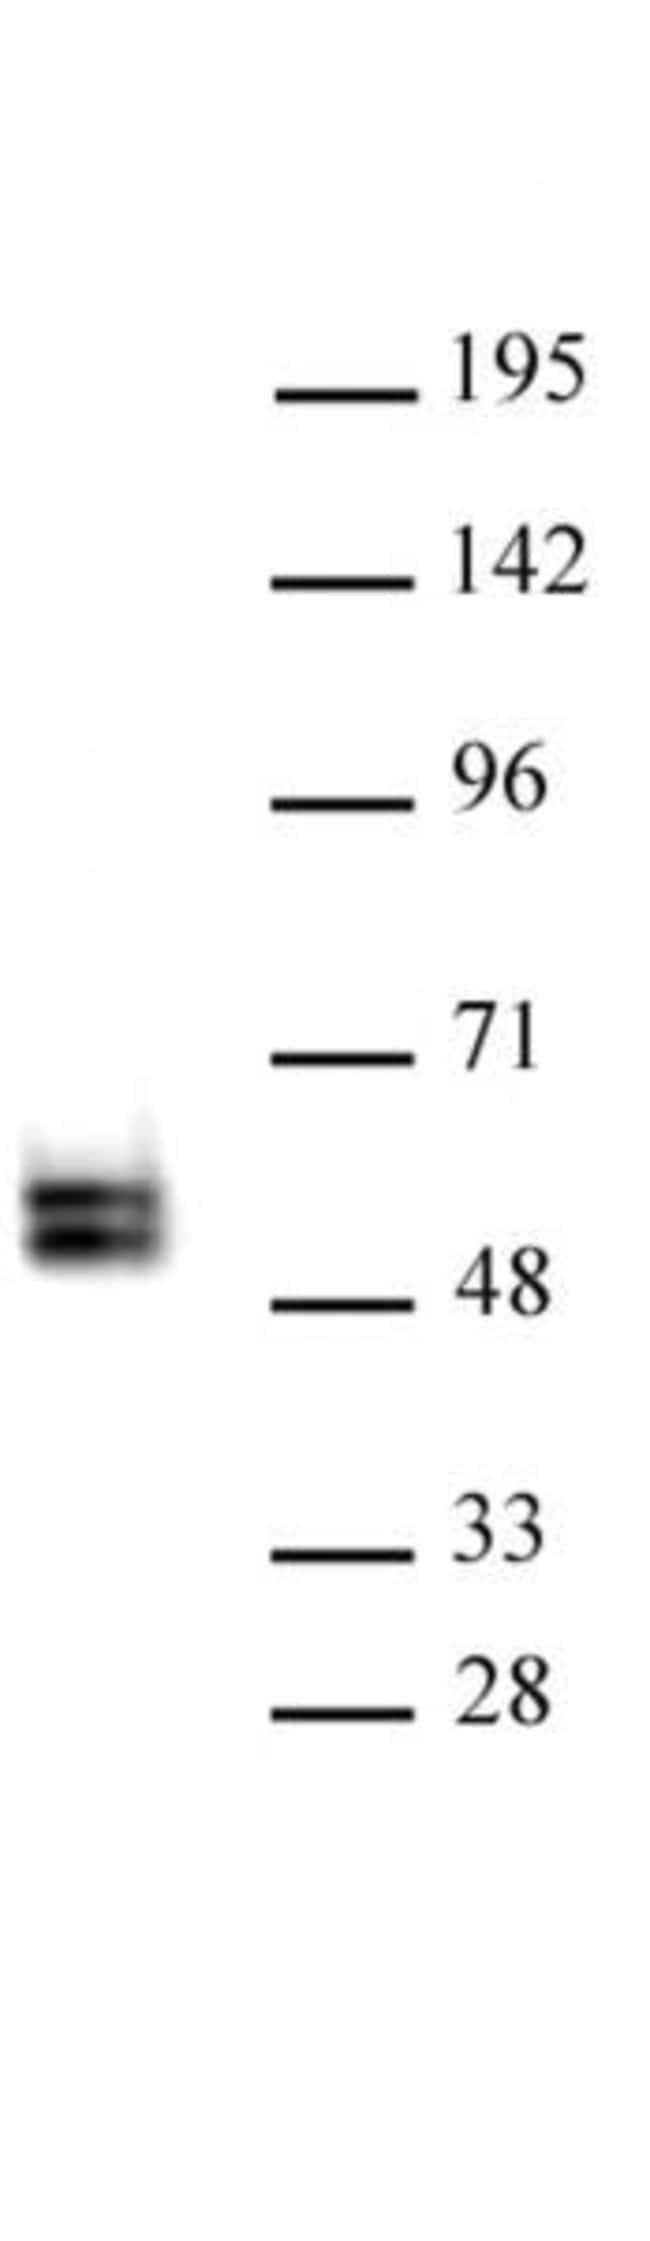 TCF7 Rabbit anti-Human, Unconjugated, Polyclonal, Active Motif:Antibodies:Primary